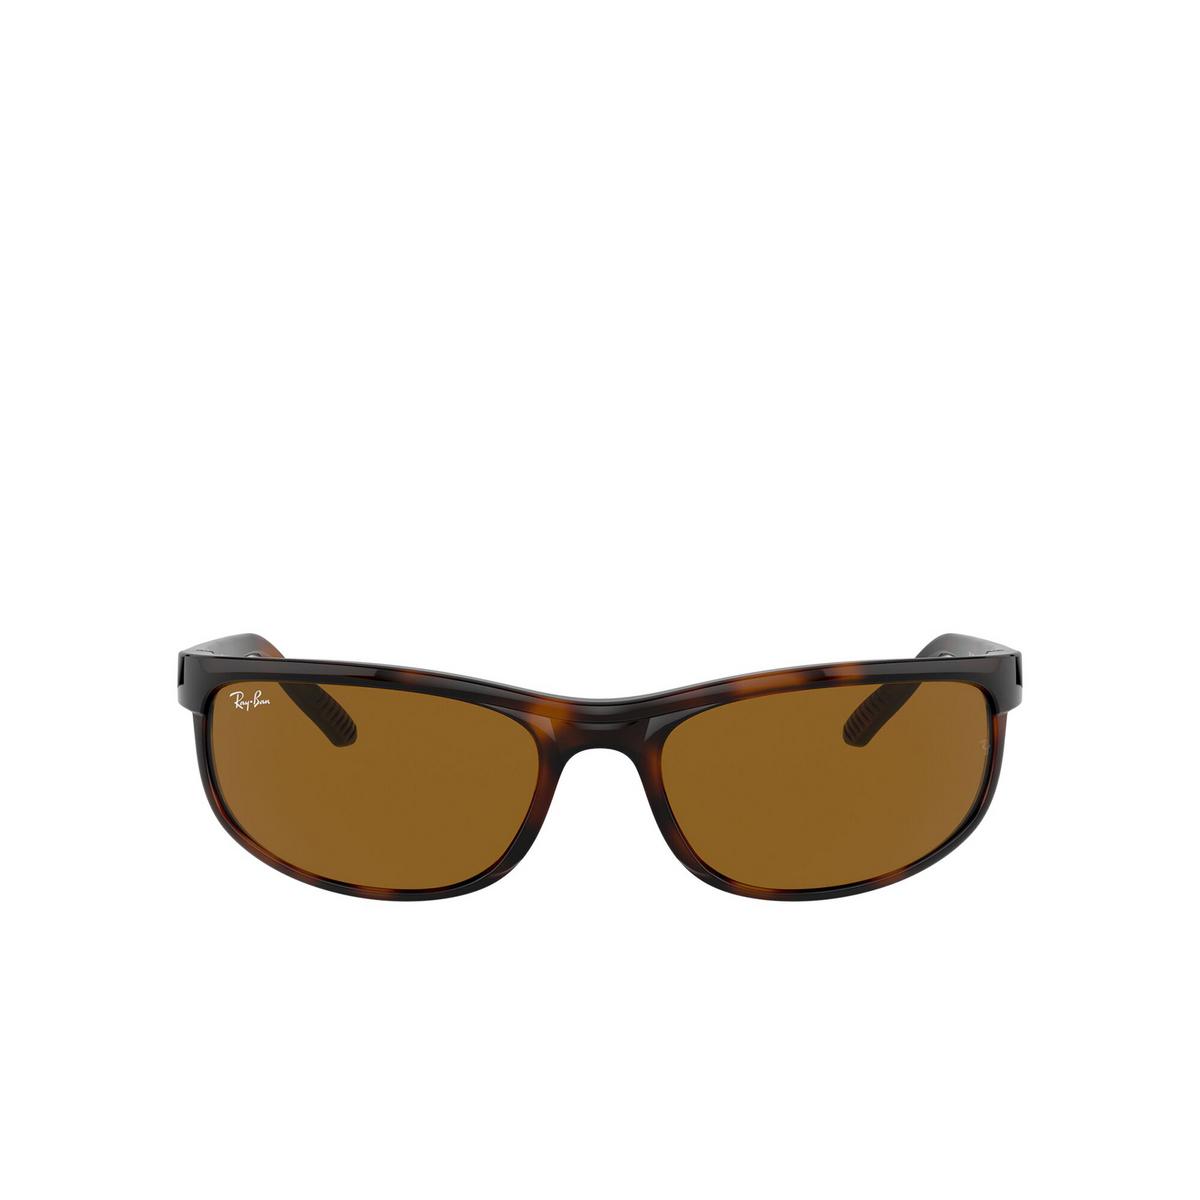 Ray-Ban® Rectangle Sunglasses: Predator 2 RB2027 color Dark Havana 650833 - front view.